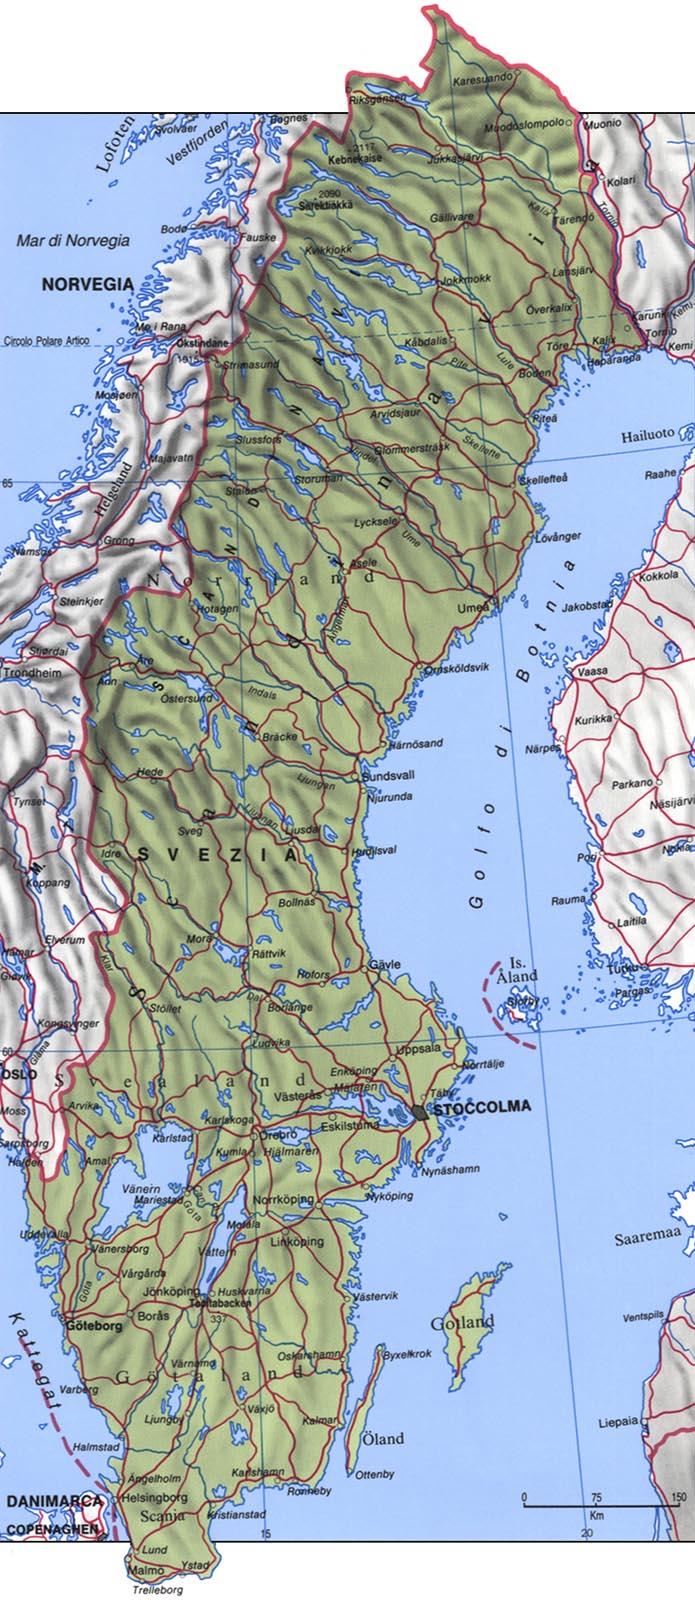 Cartina della Svezia